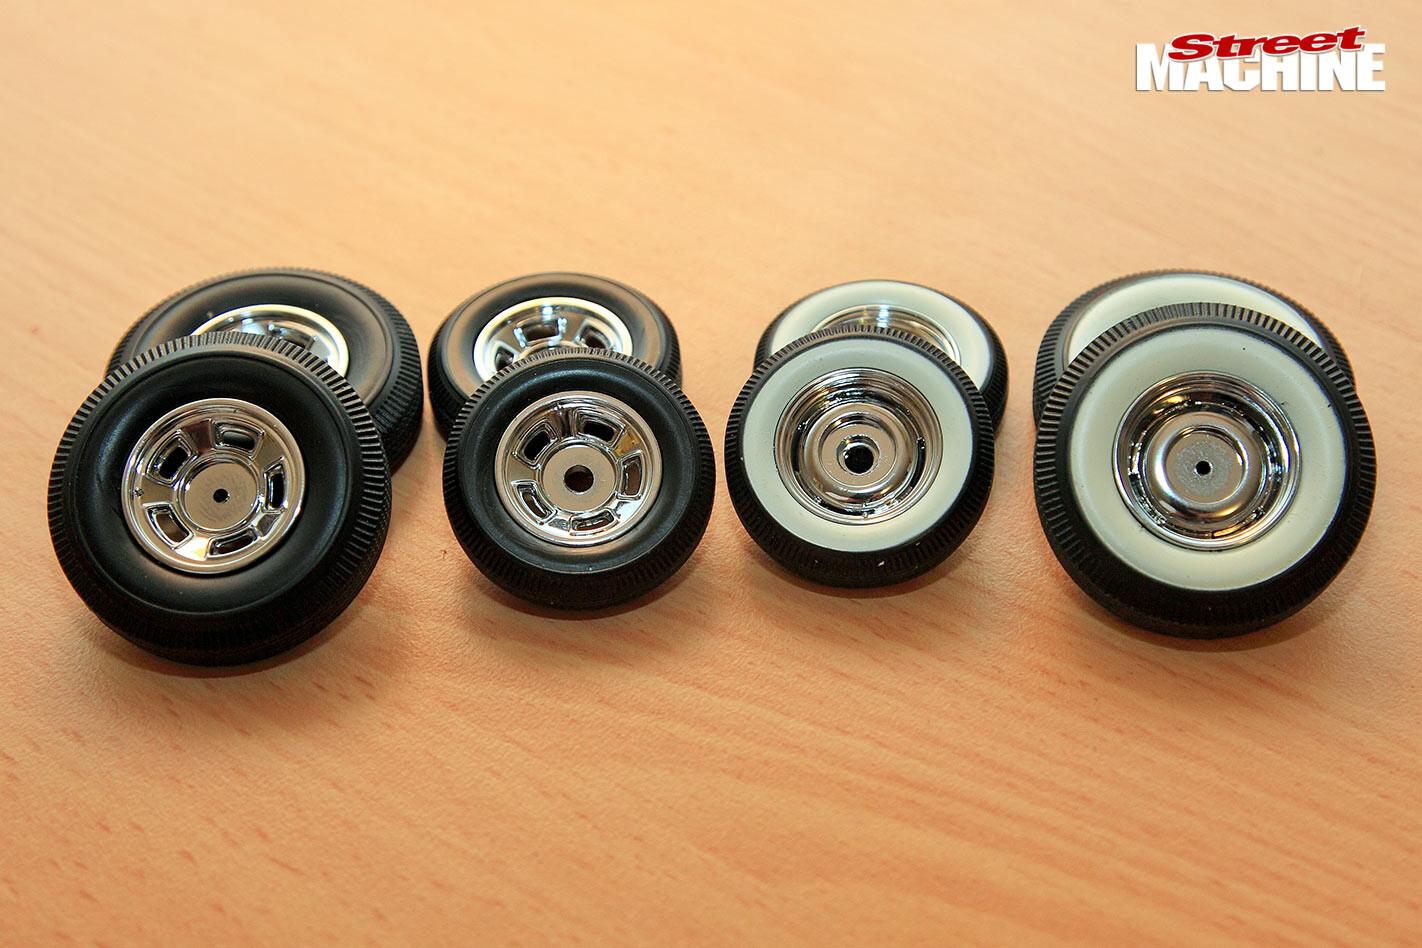 car model kit wheels